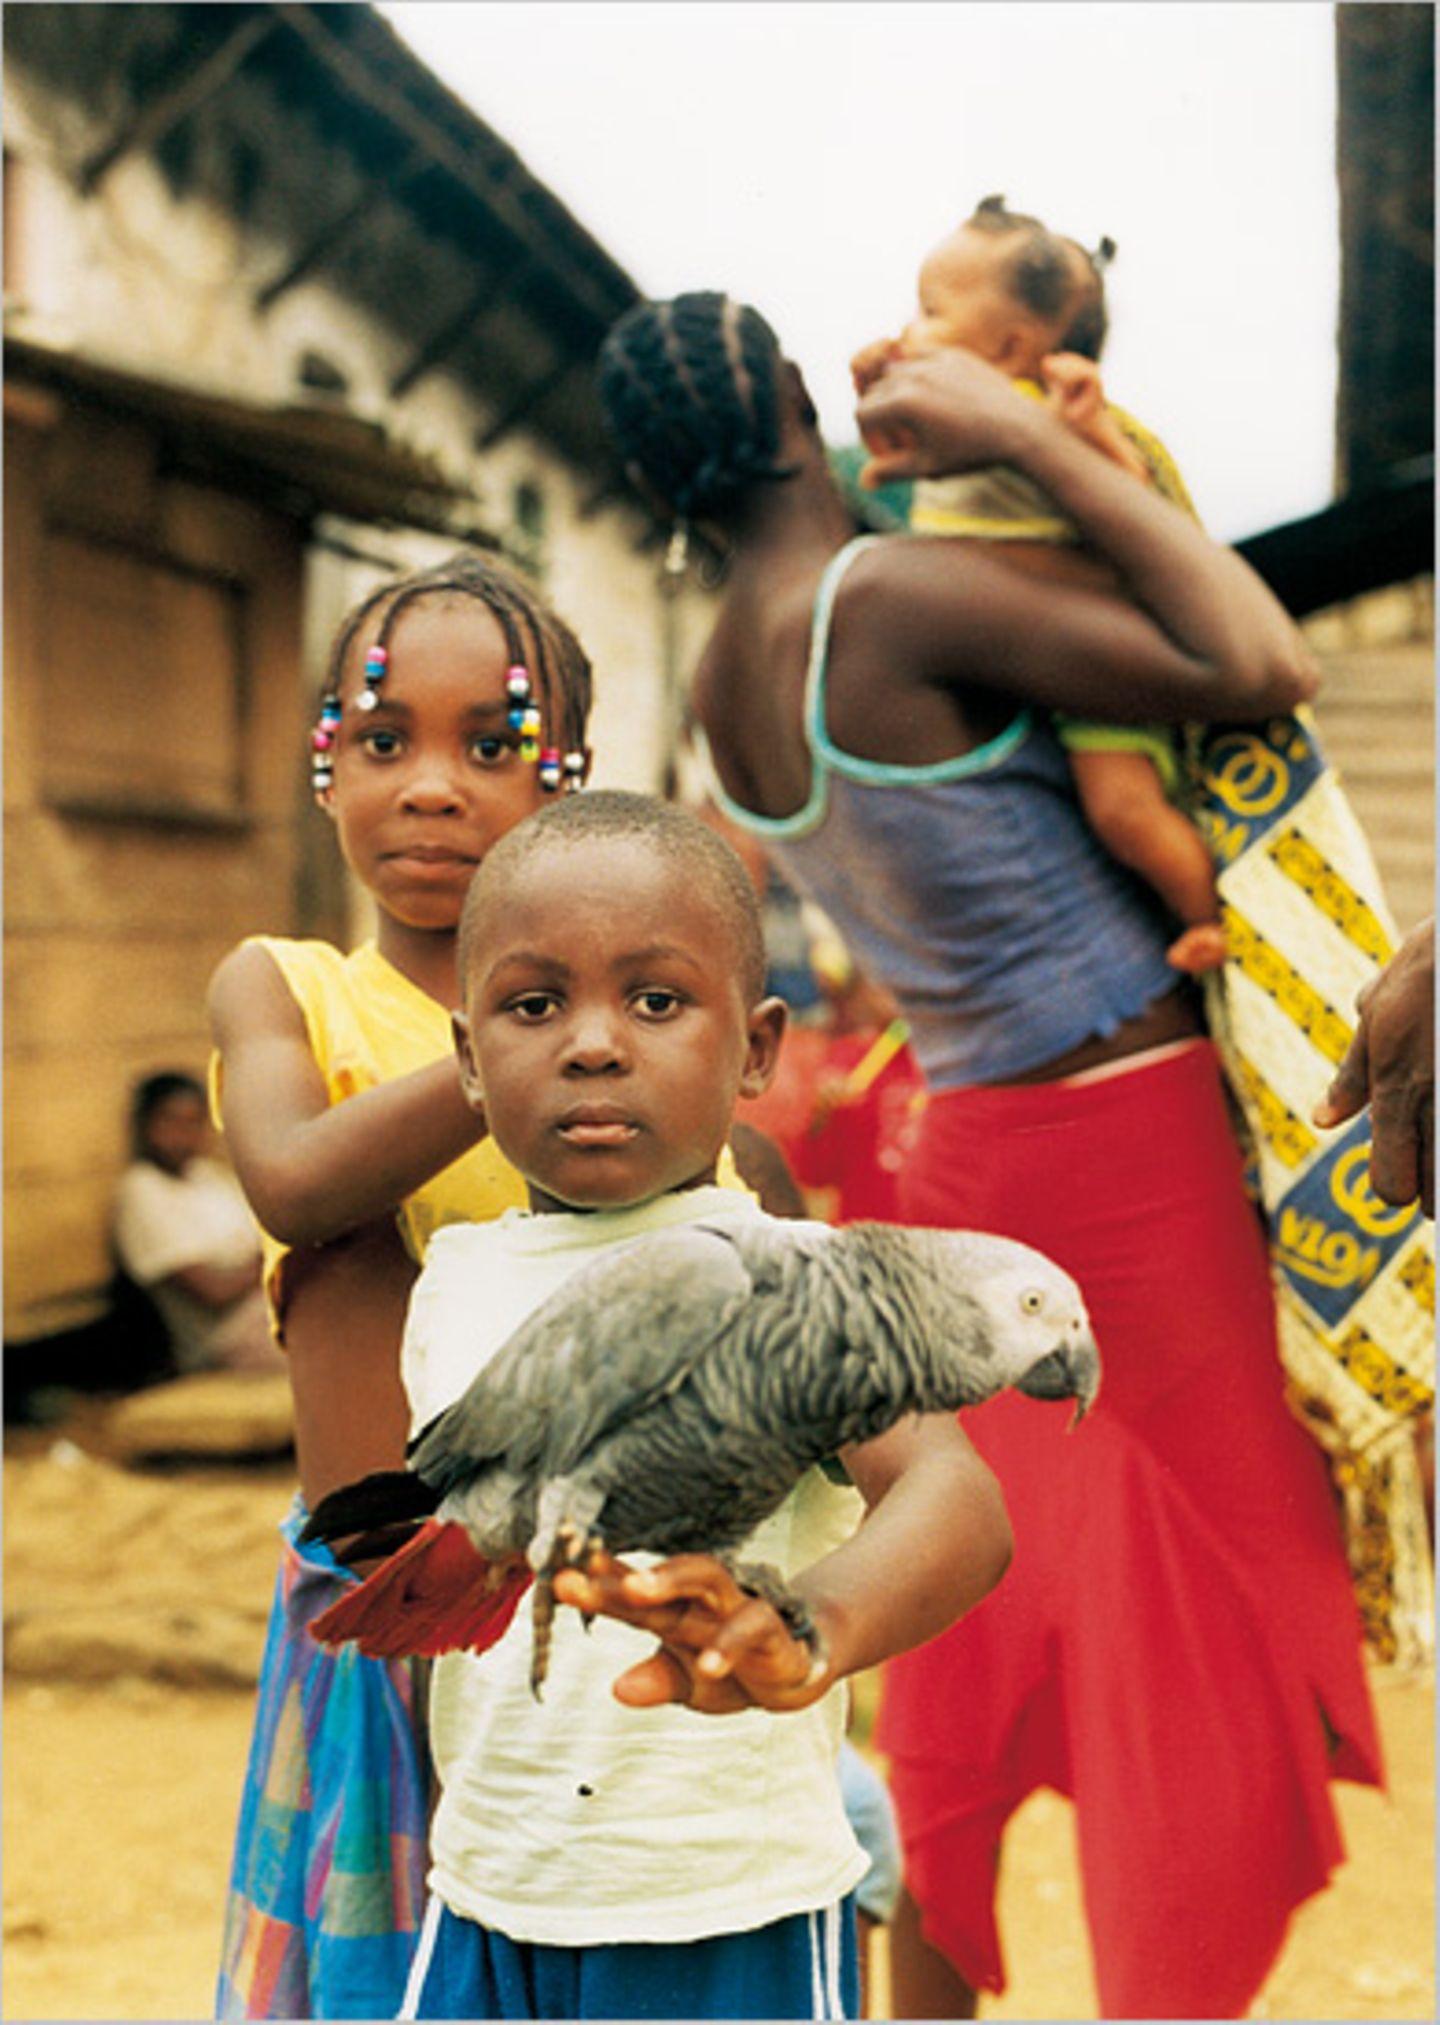 São Tomé & Príncipe: Inseln der Illusionen - Bild 6